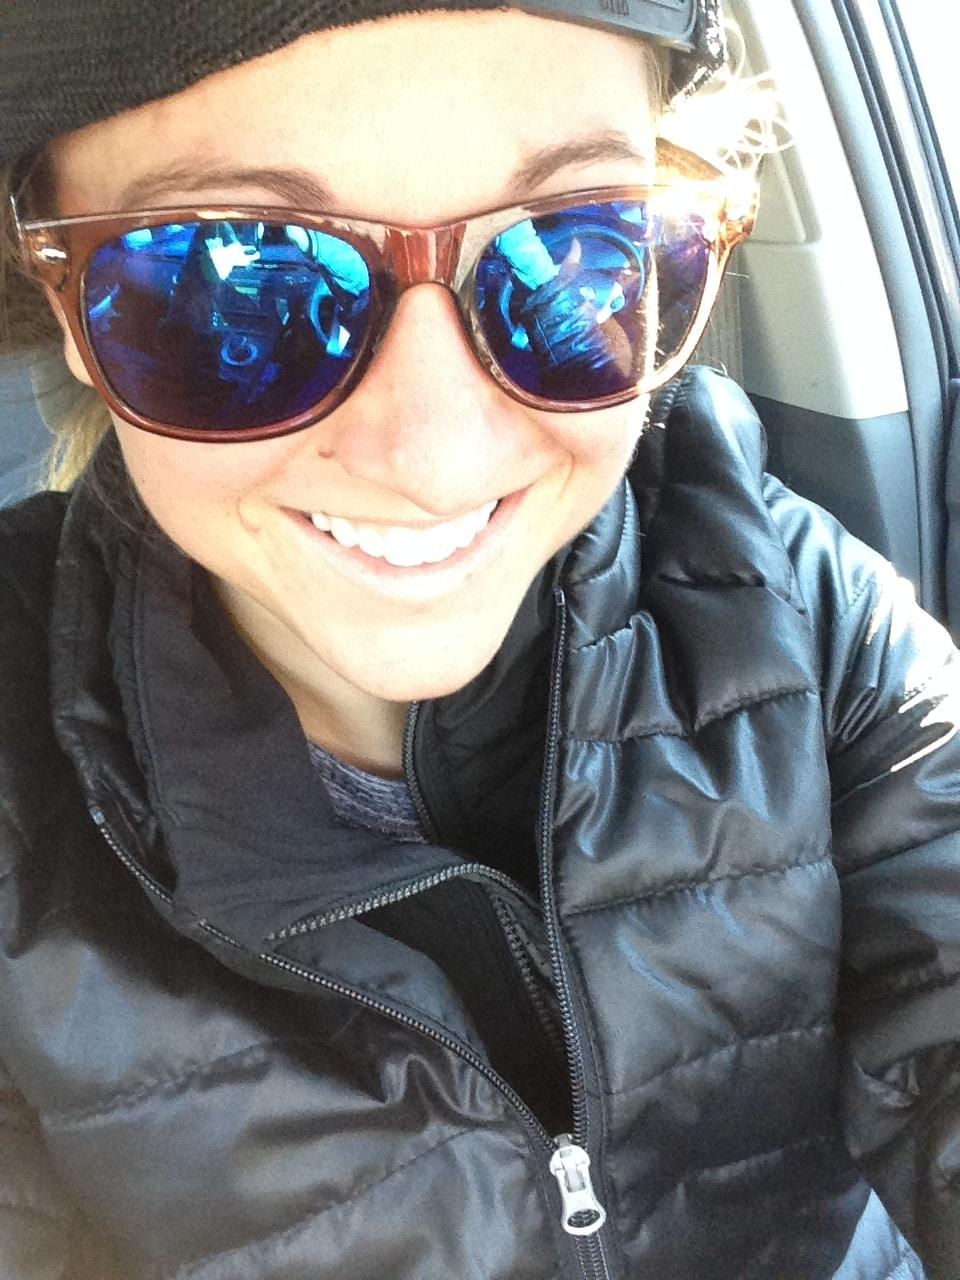 Go to Samantha Nivens's profile